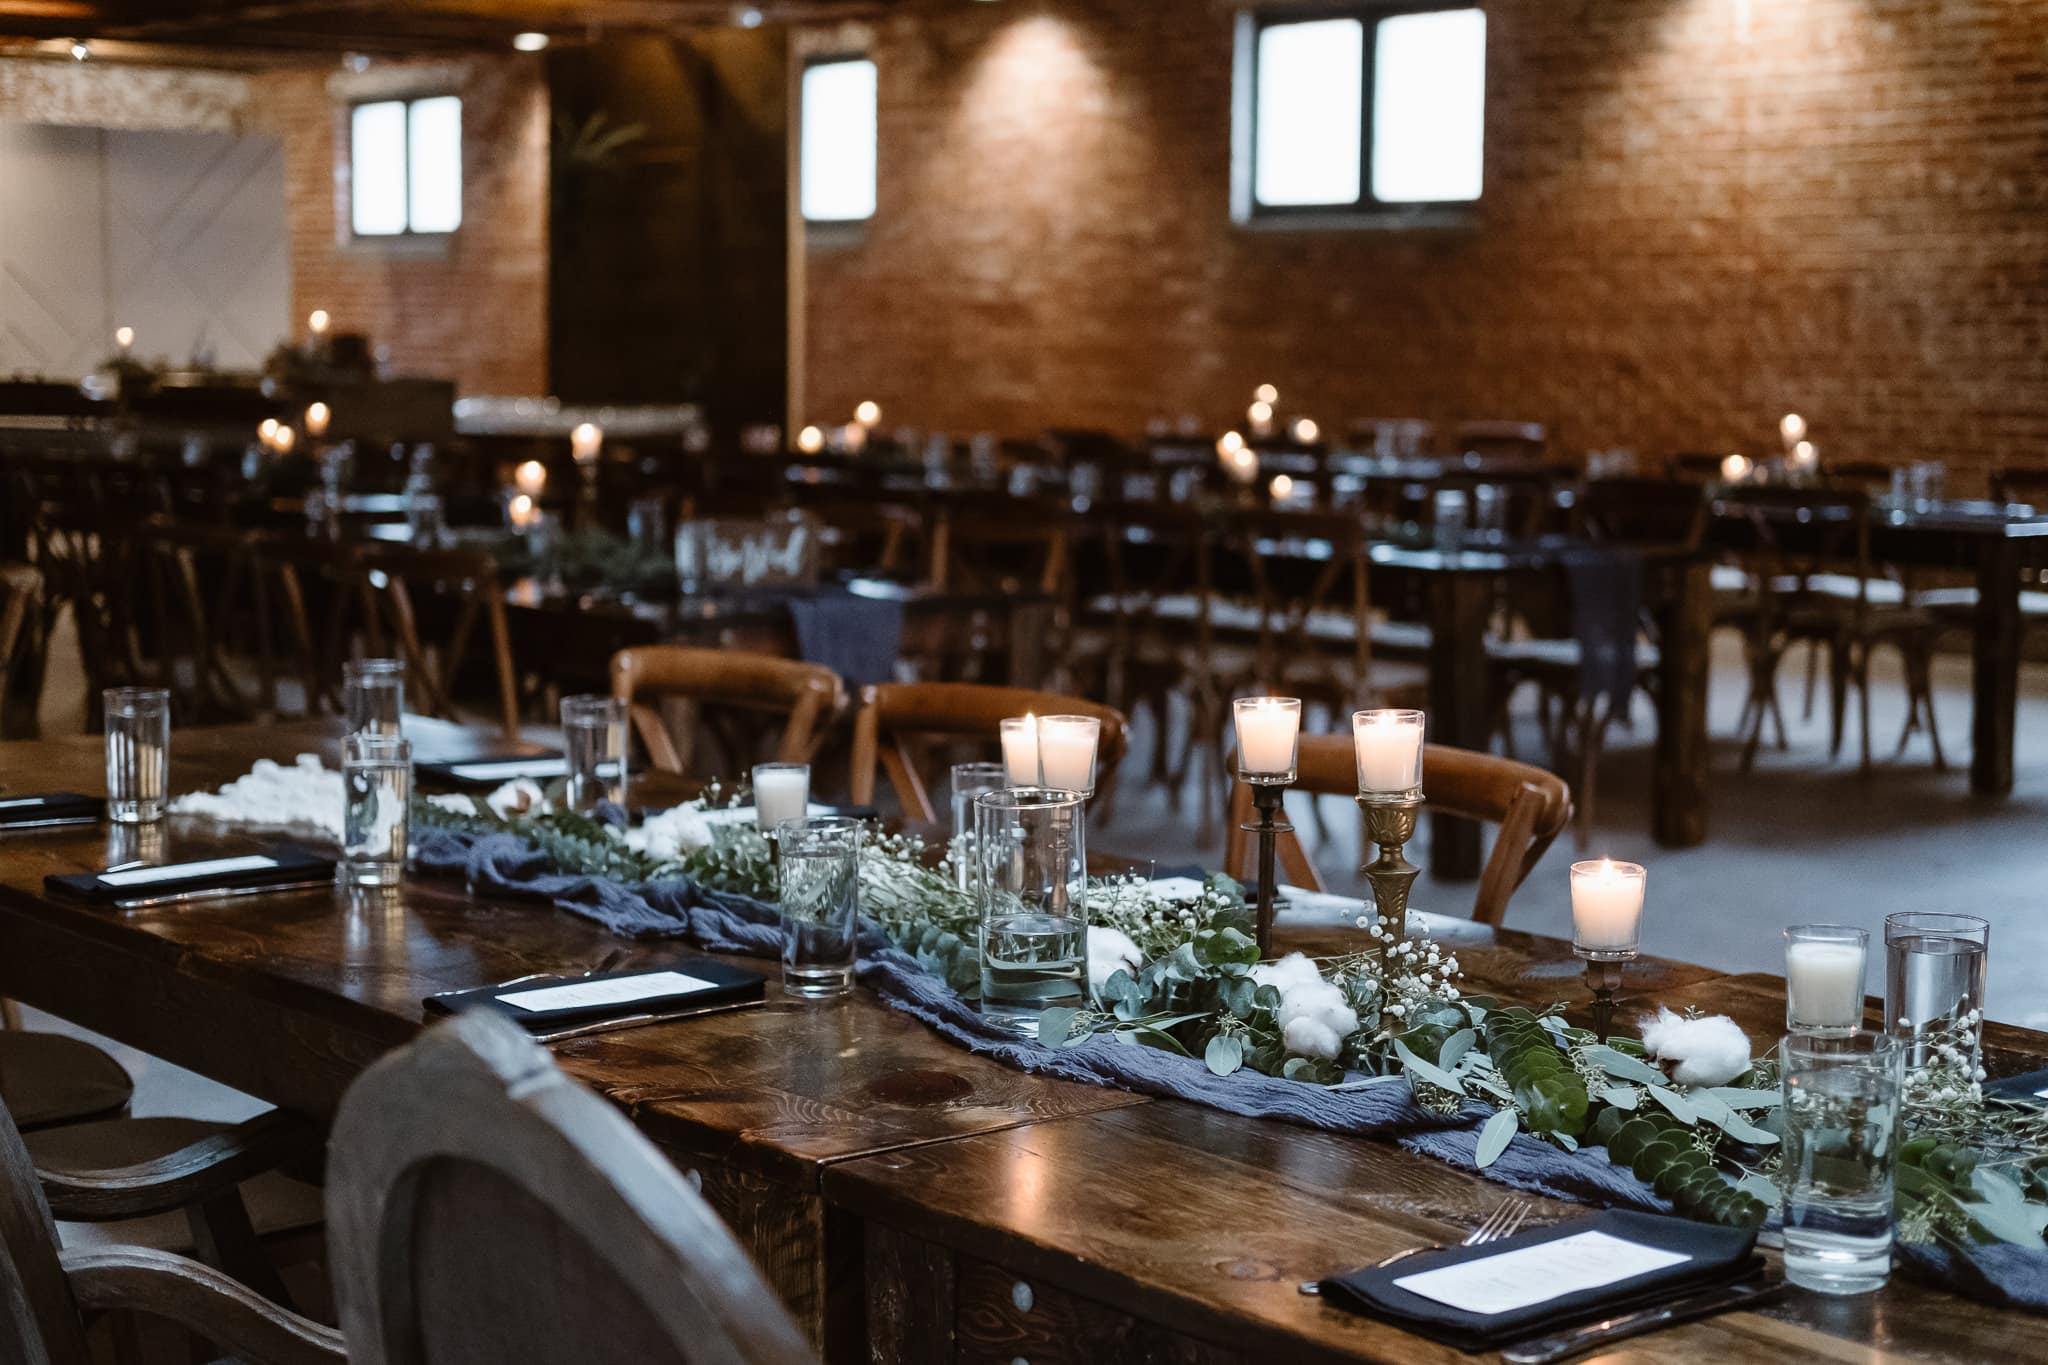 St Vrain Wedding Photographer | Longmont Wedding Photographer | Colorado Winter Wedding Photographer, Colorado industrial chic wedding ceremony, reception decor with navy and dark wood, planning by Brindle + Oak